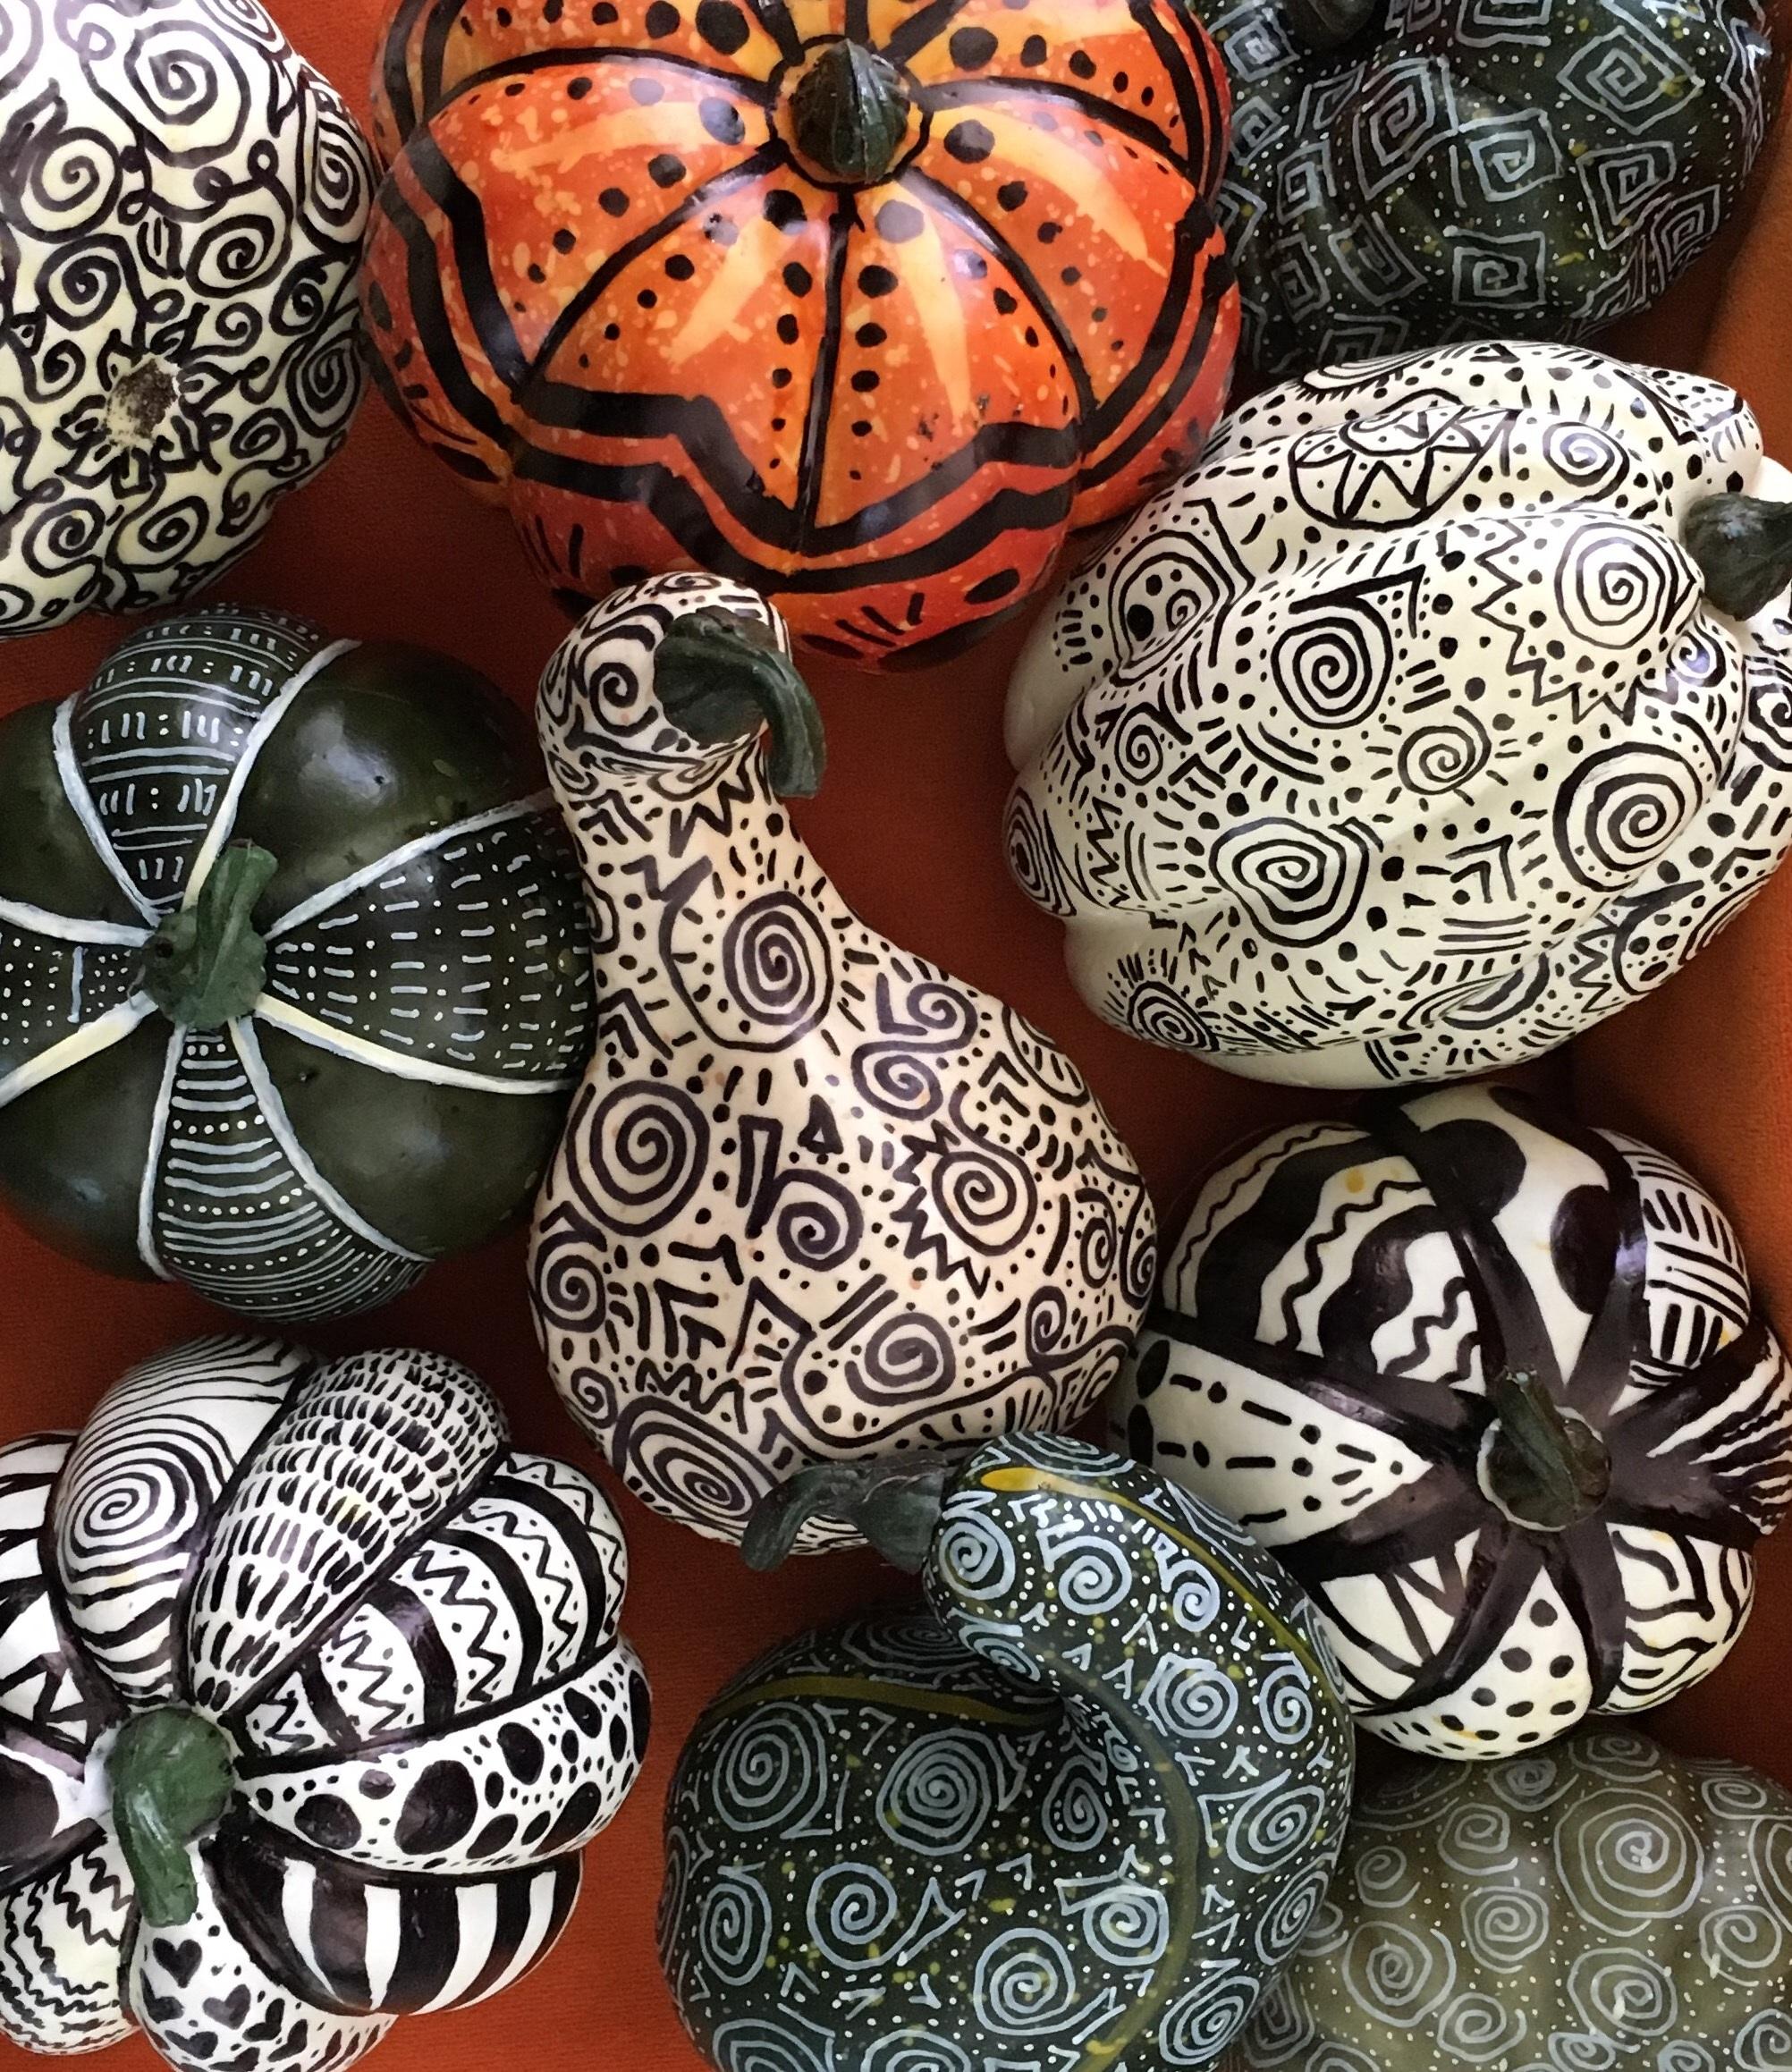 halfpeeledbanana-hand-painted-pumpkins.jpg